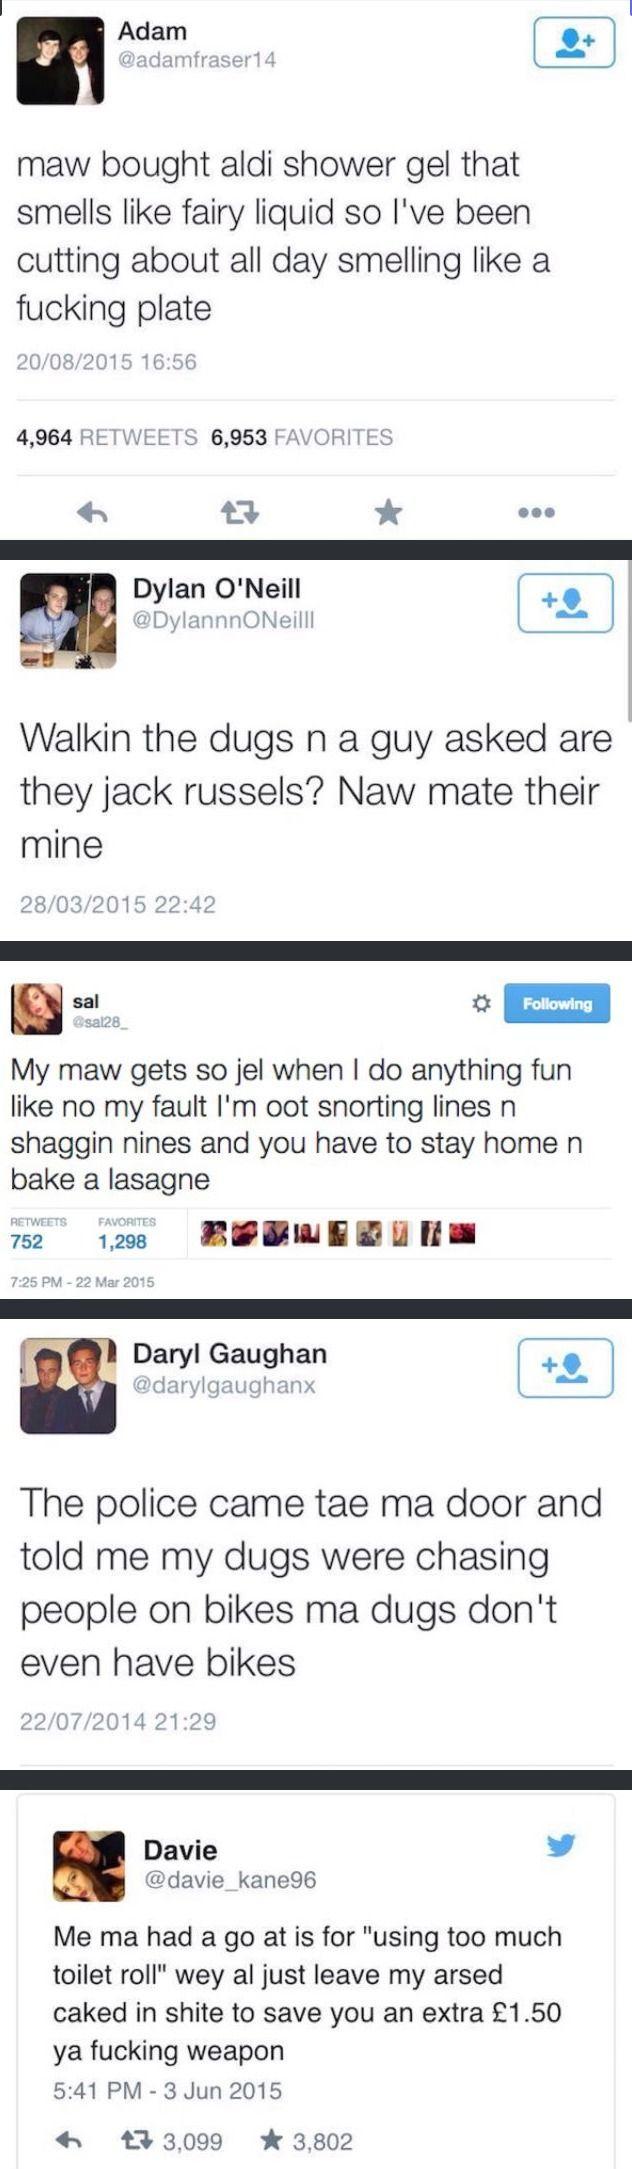 Scottish Twitter. Because God made the Scots just a wee bit weirder.